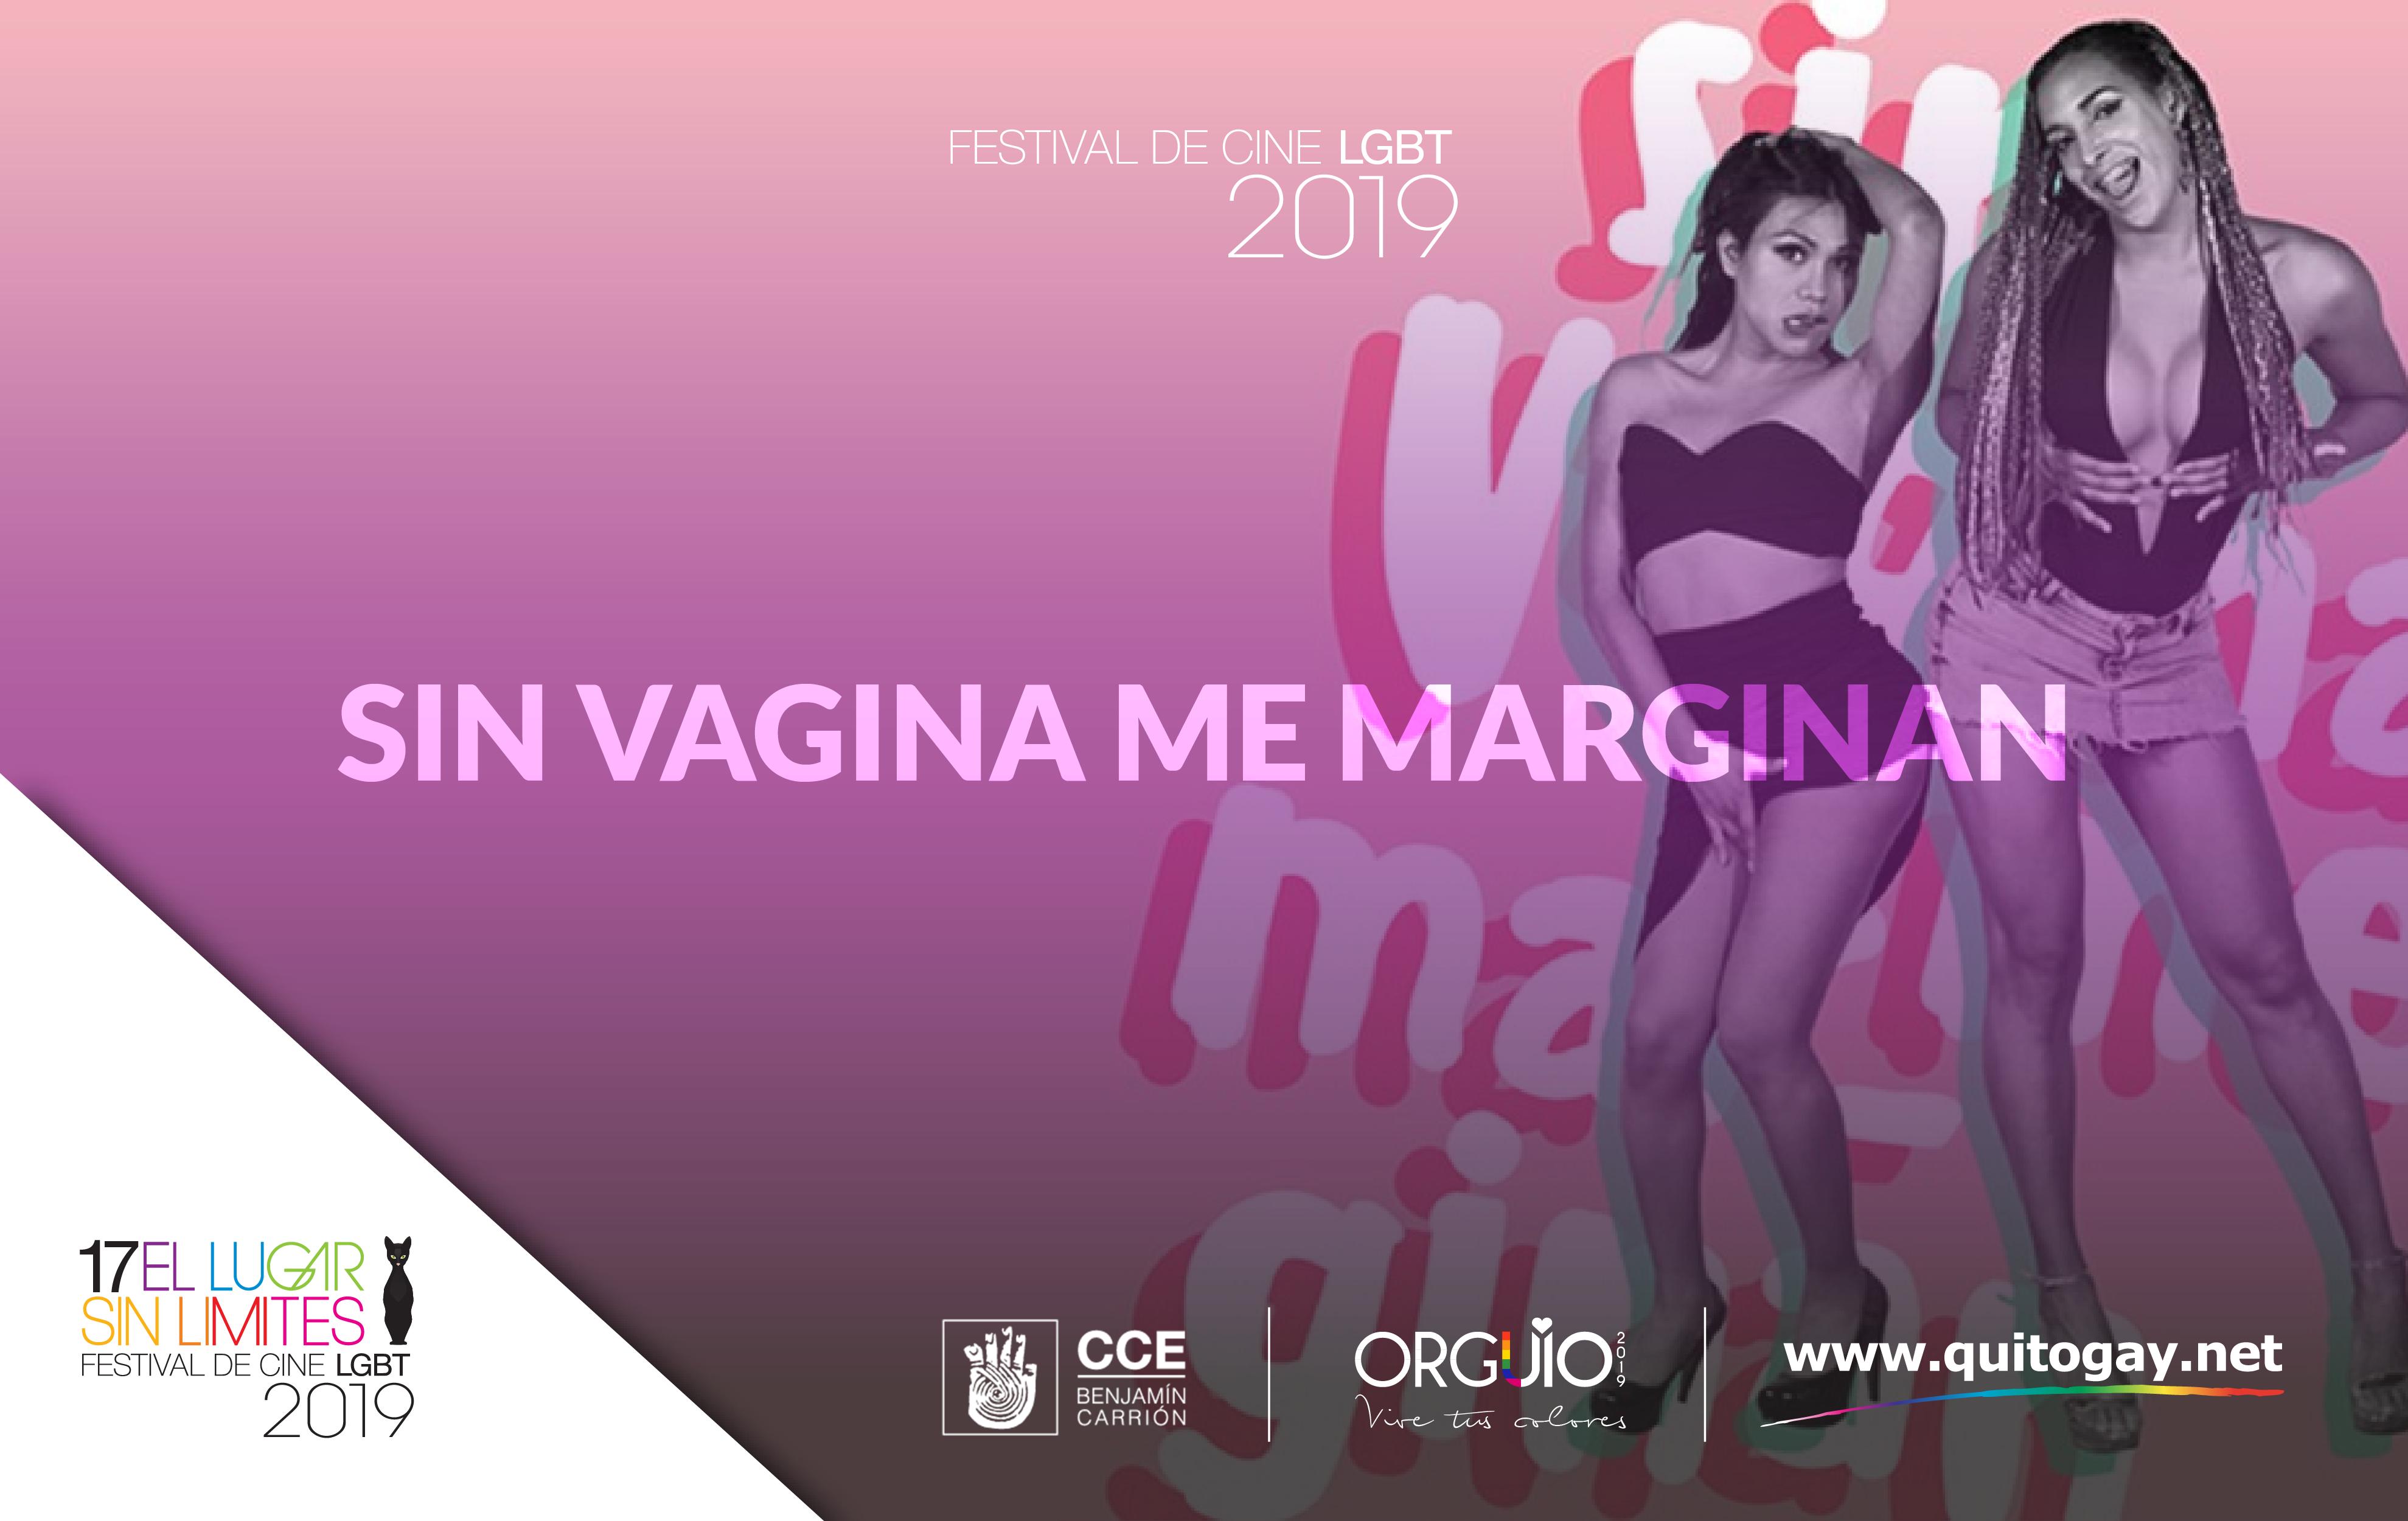 sin vagina me marginan